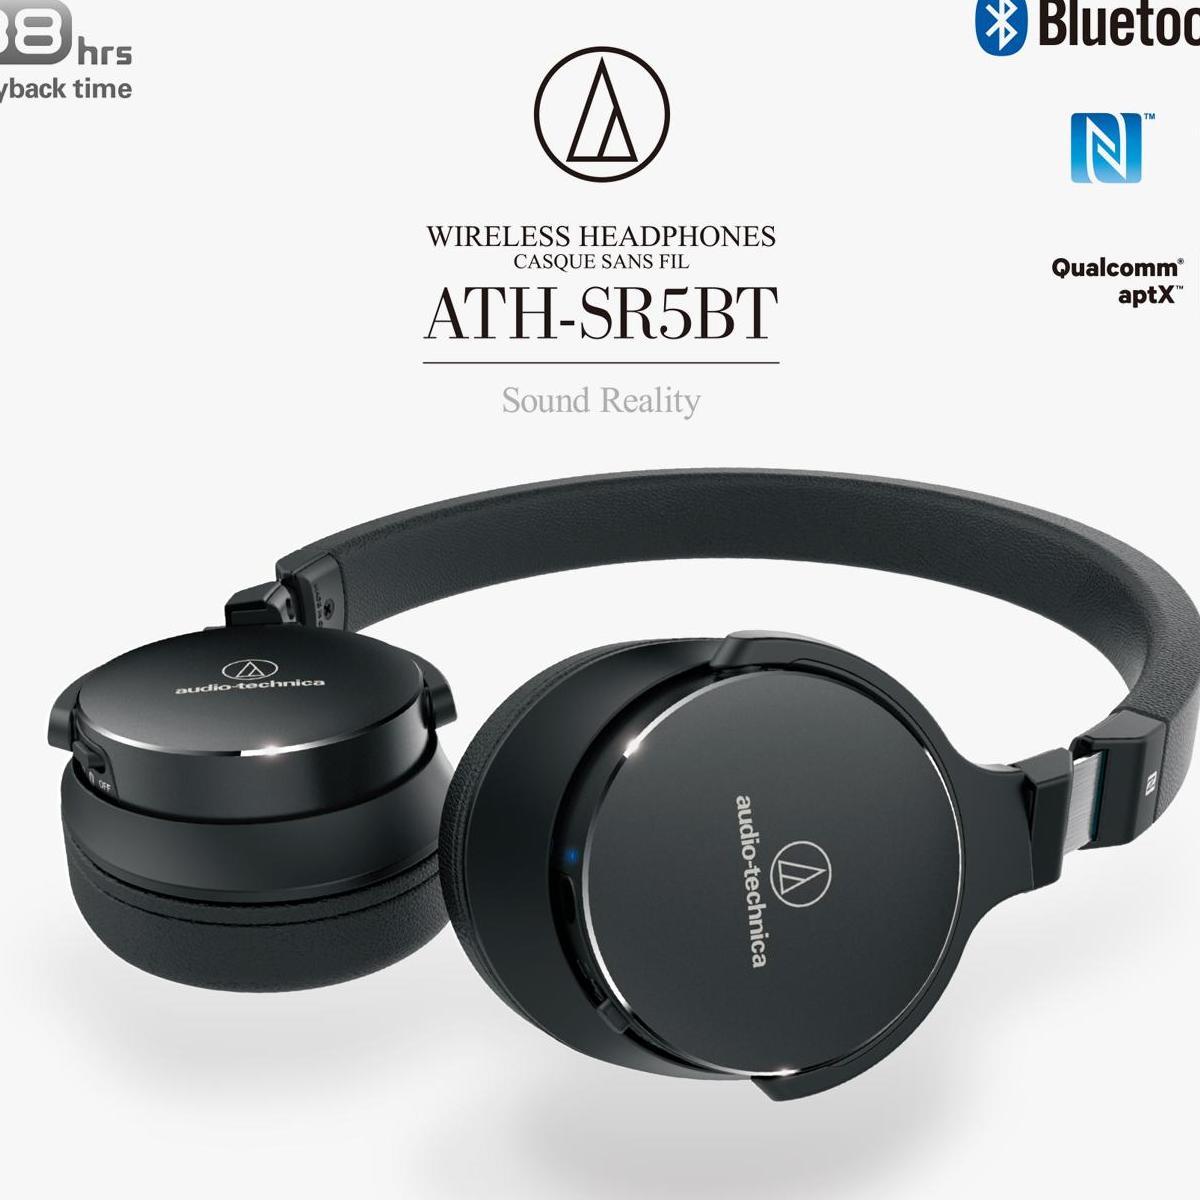 Audio Technica Ath Sr5bt High Resolution Wireless On Ear Headphones Earphone Solid Bass Cks1100is Singapore